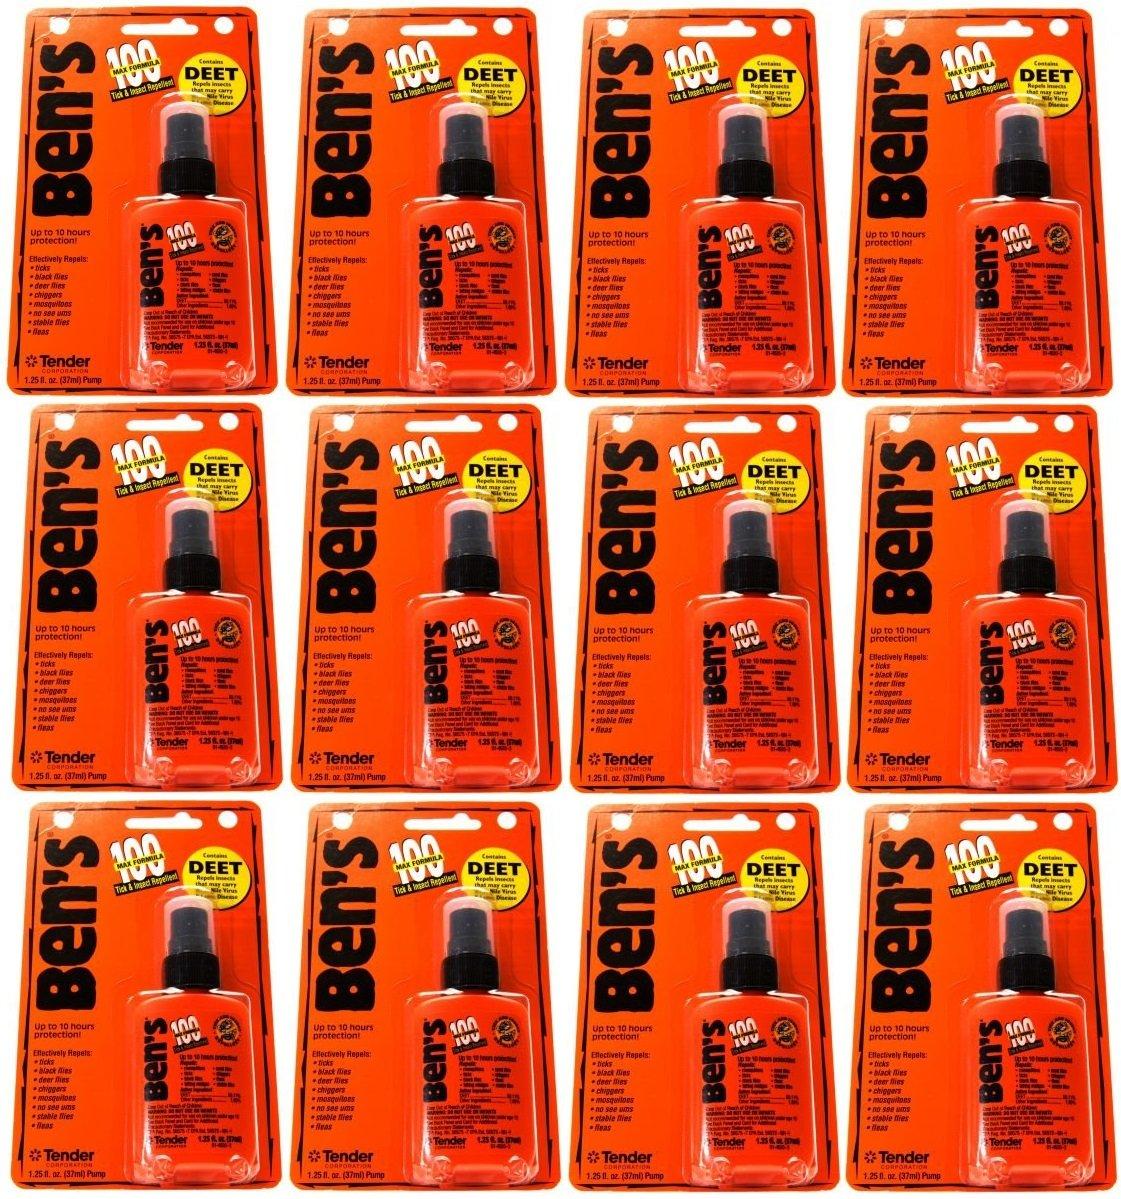 Ben's 100 Deet Max Formula Tick & Insect Repellent - 1.25 oz spray (case of 12)